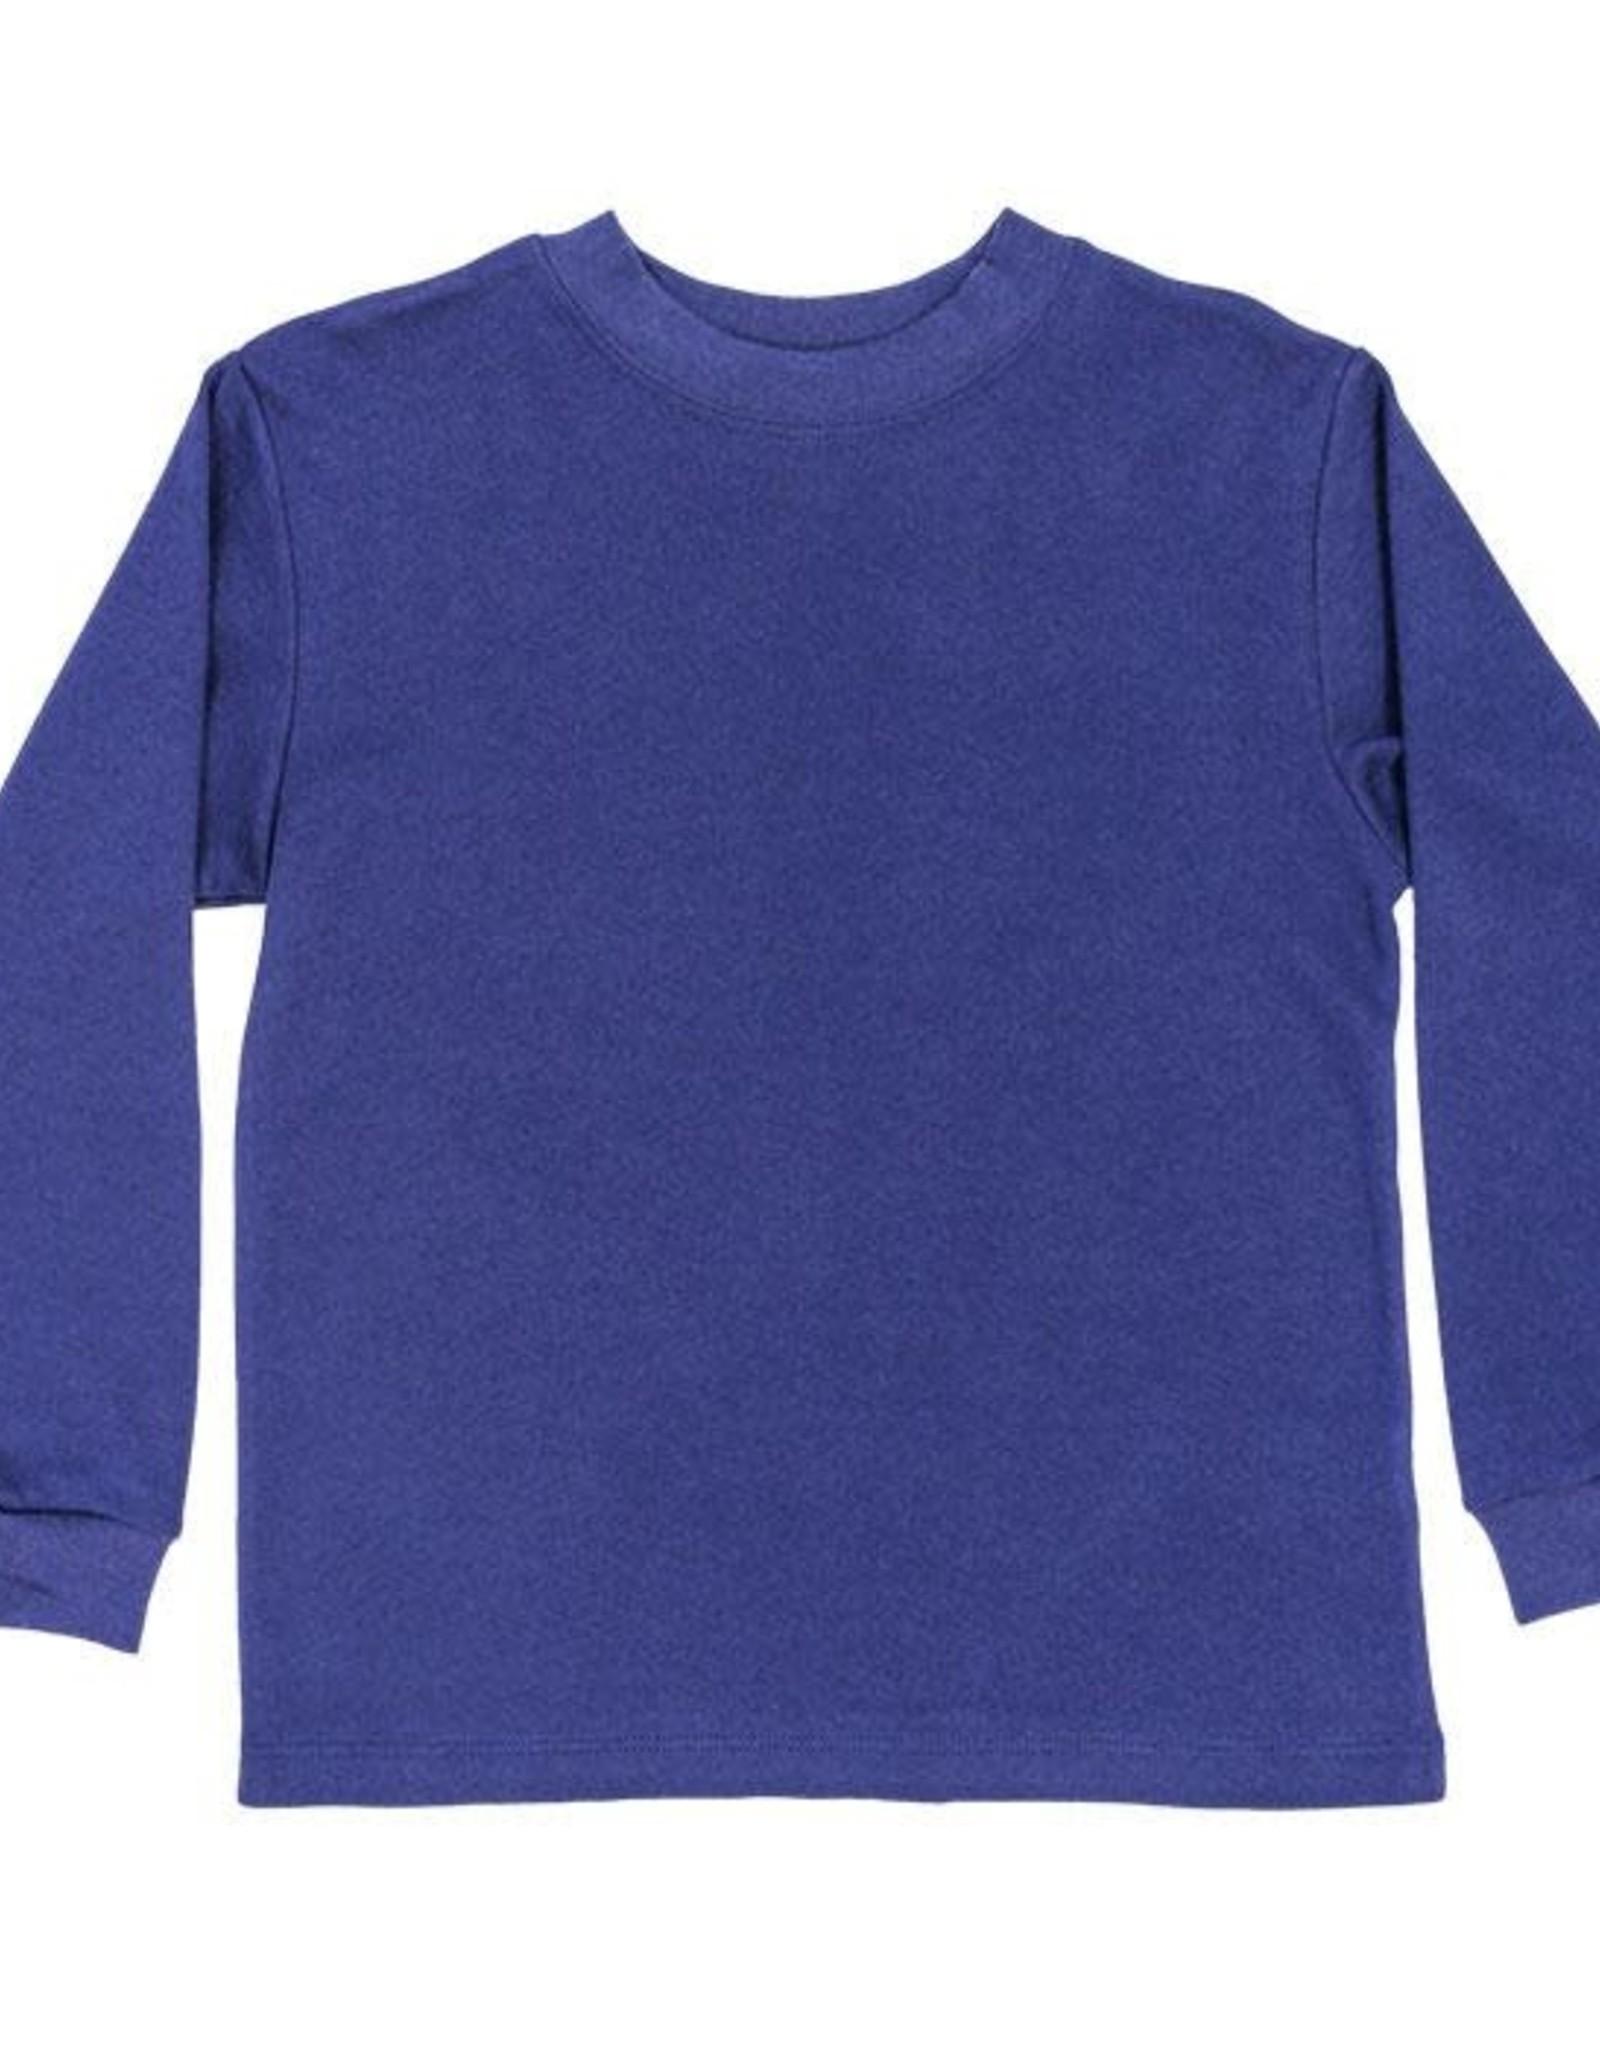 The Bailey Boys Navy Knit, T-Shirt